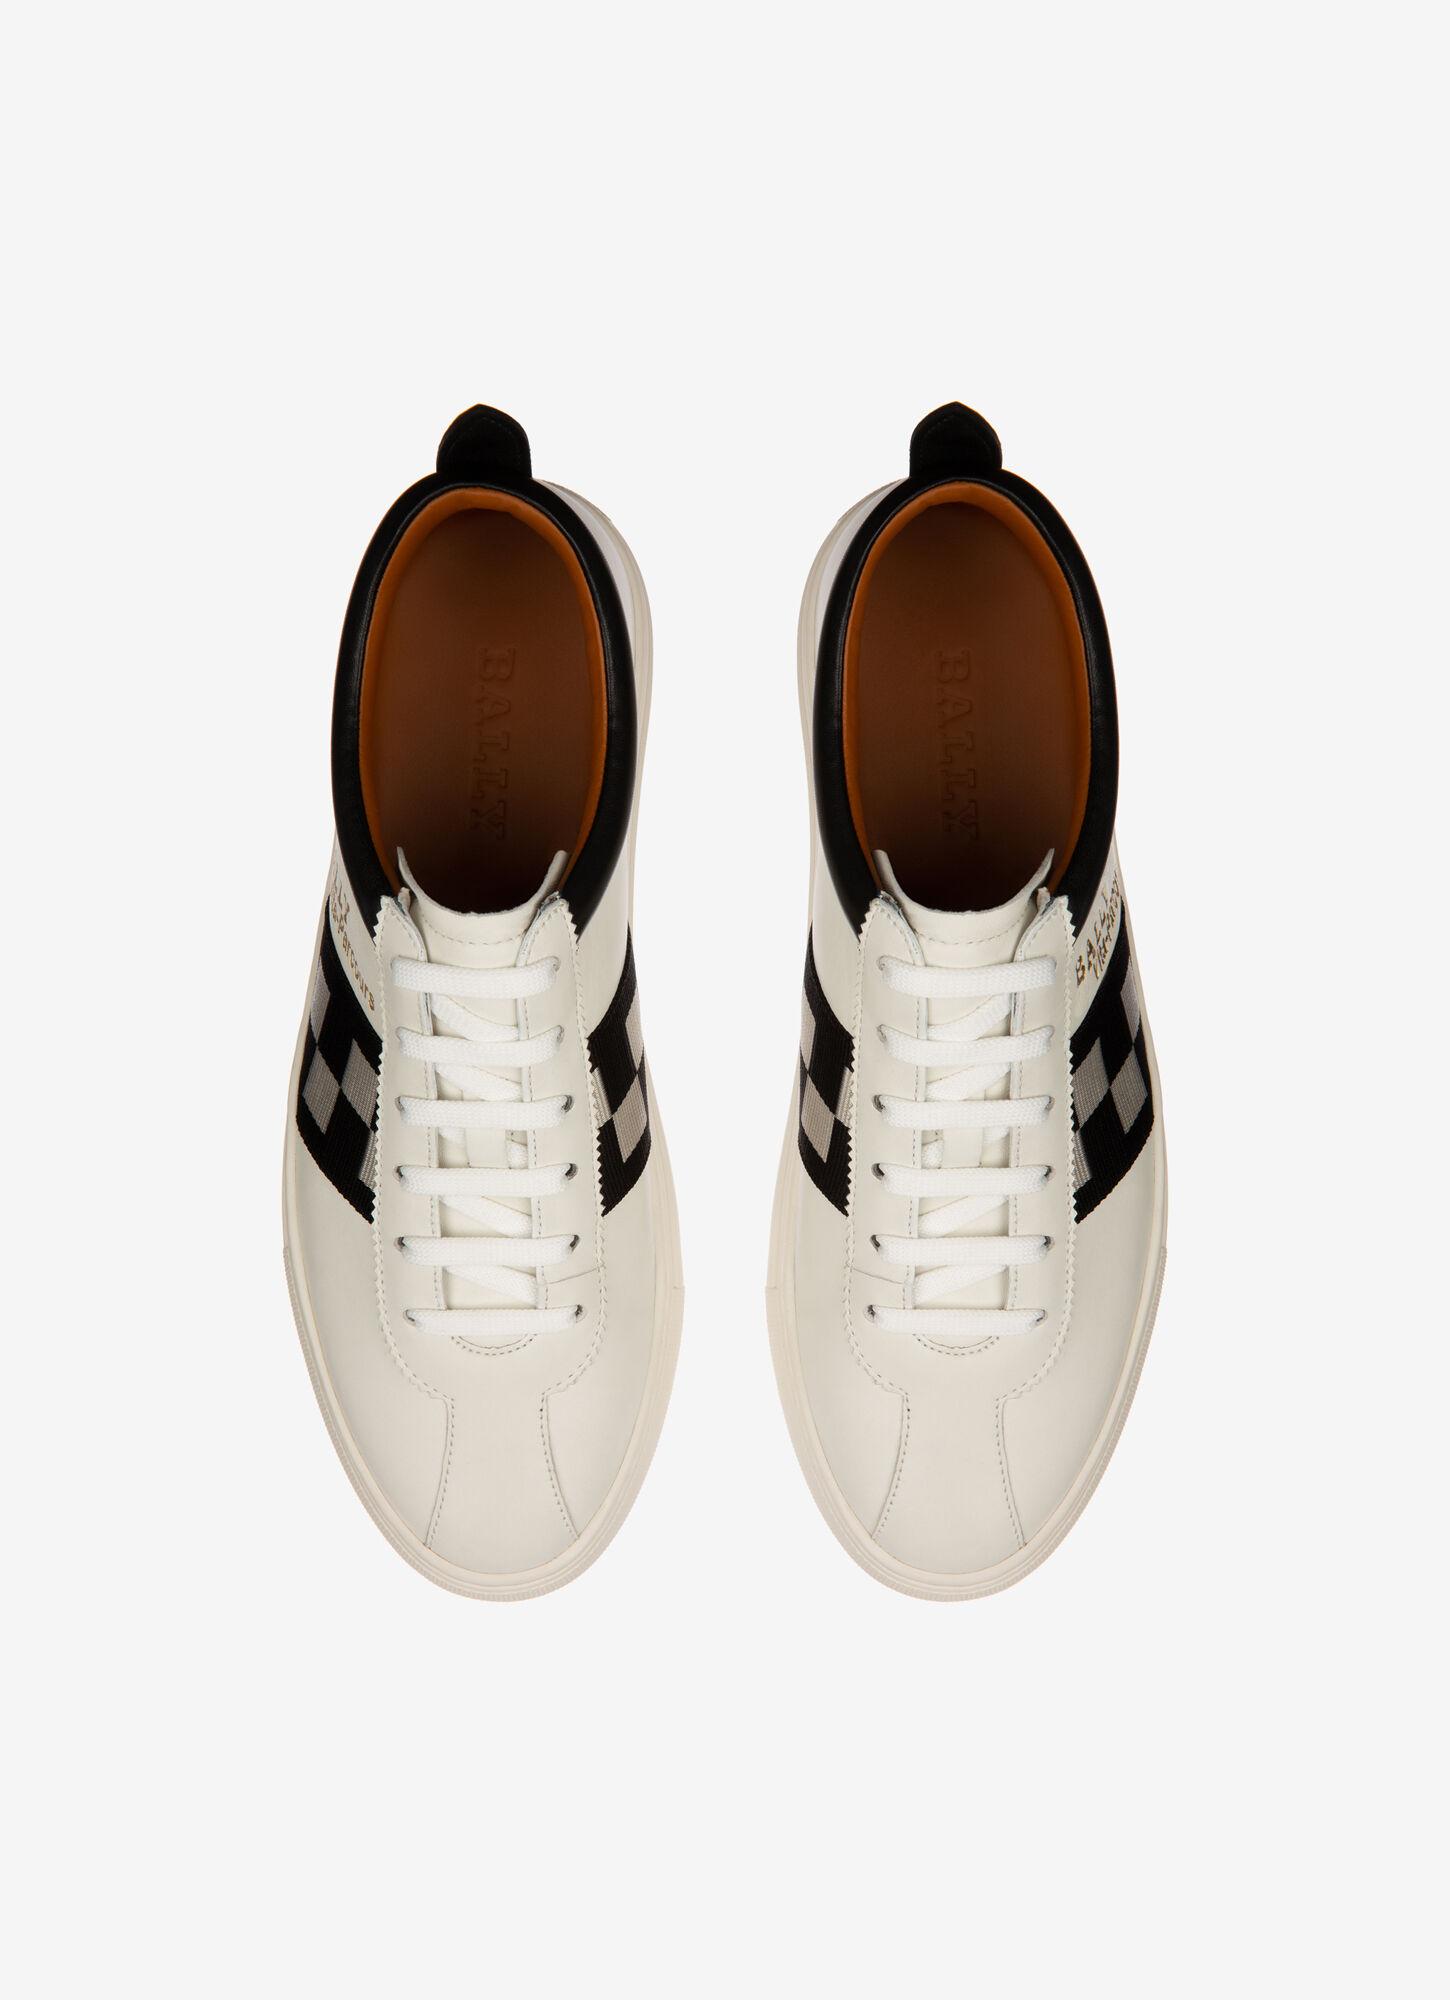 VITA-PARCOURS  Mens Sneakers   White